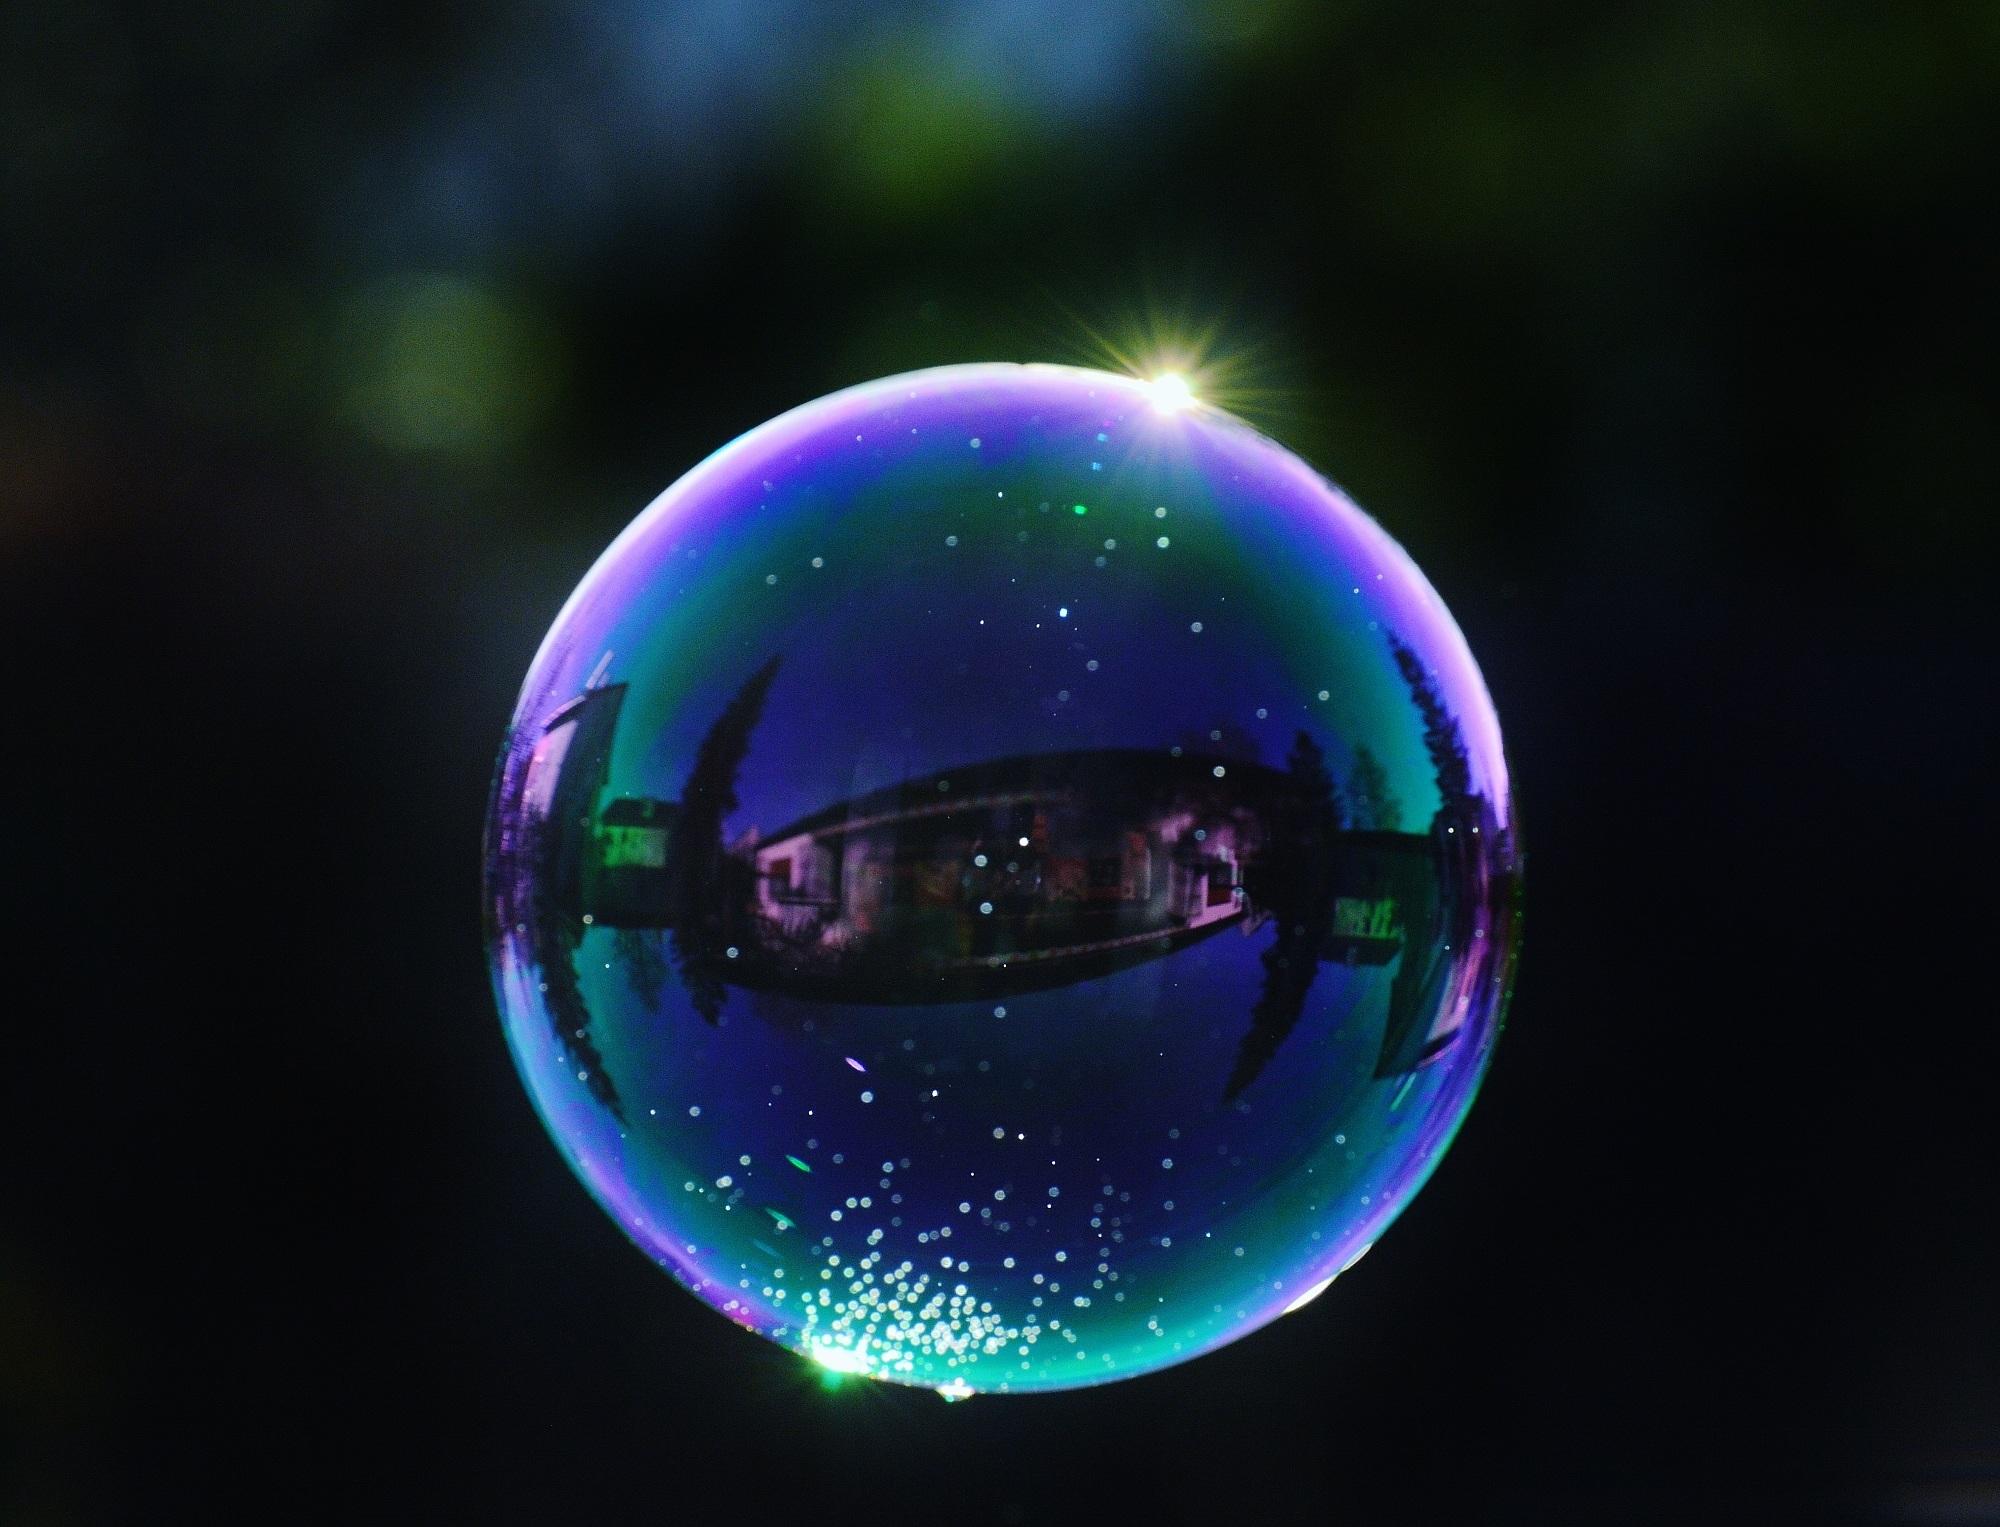 Circle Earth Ball Sphere Balls Soap Bubble Shape Mirroring Screenshot Macro Photography Make Bubbles Soapy Water Computer Wallpaper